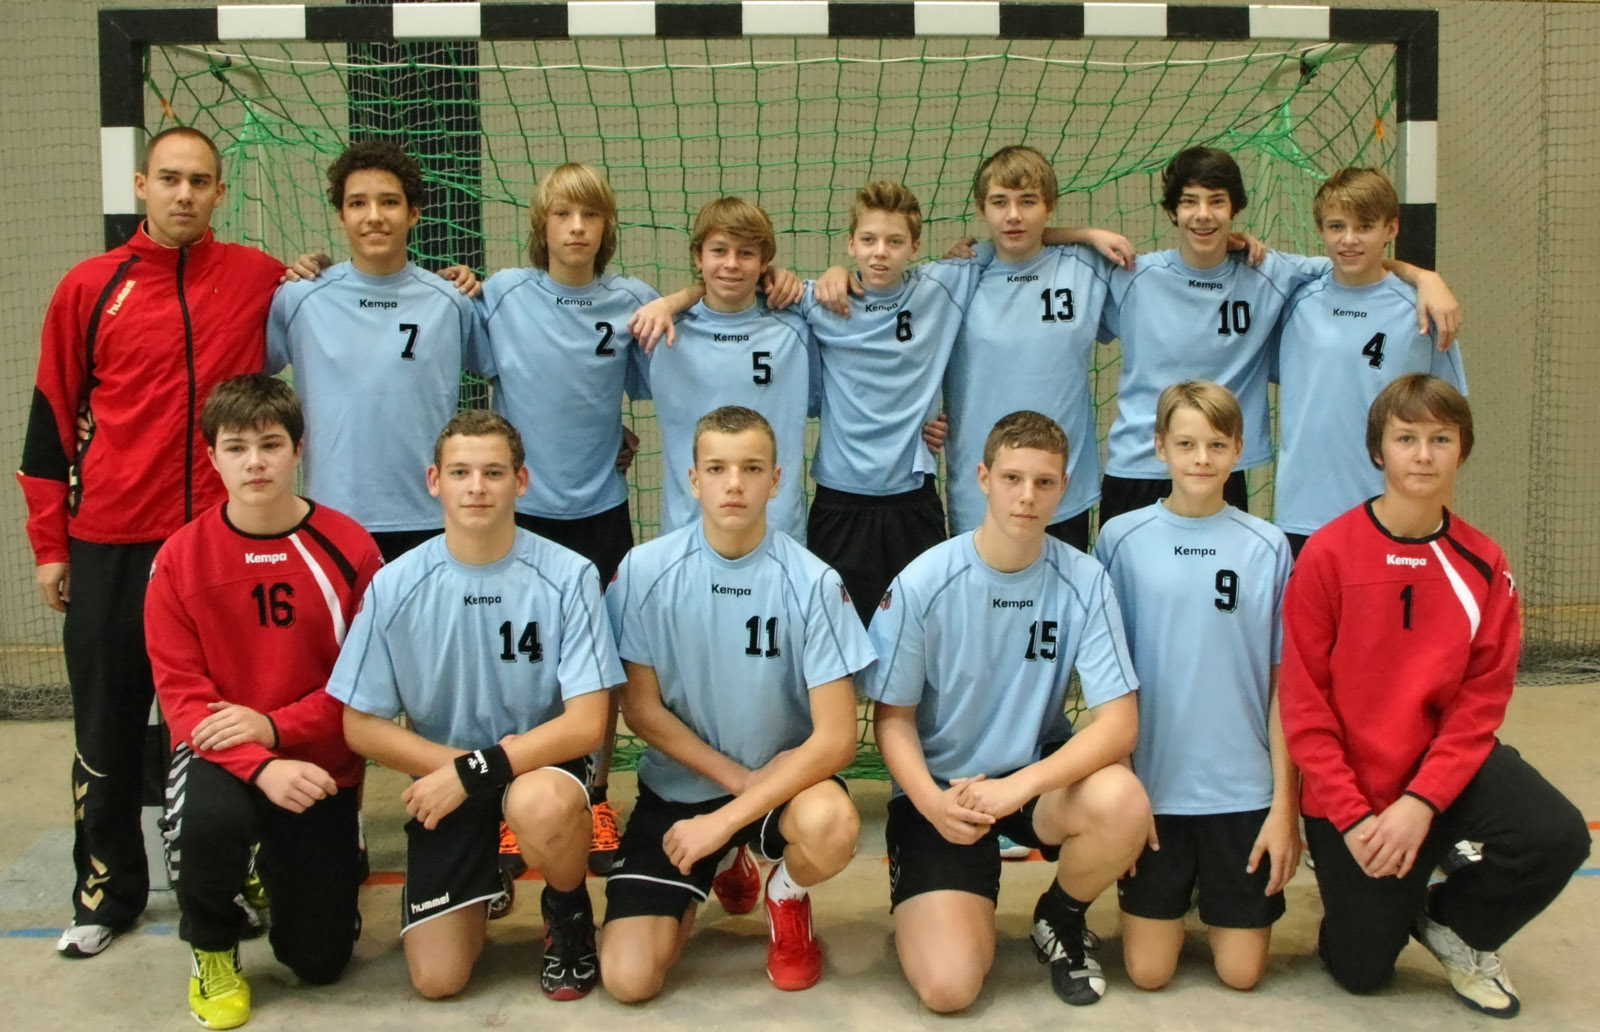 Handballverband Hessen